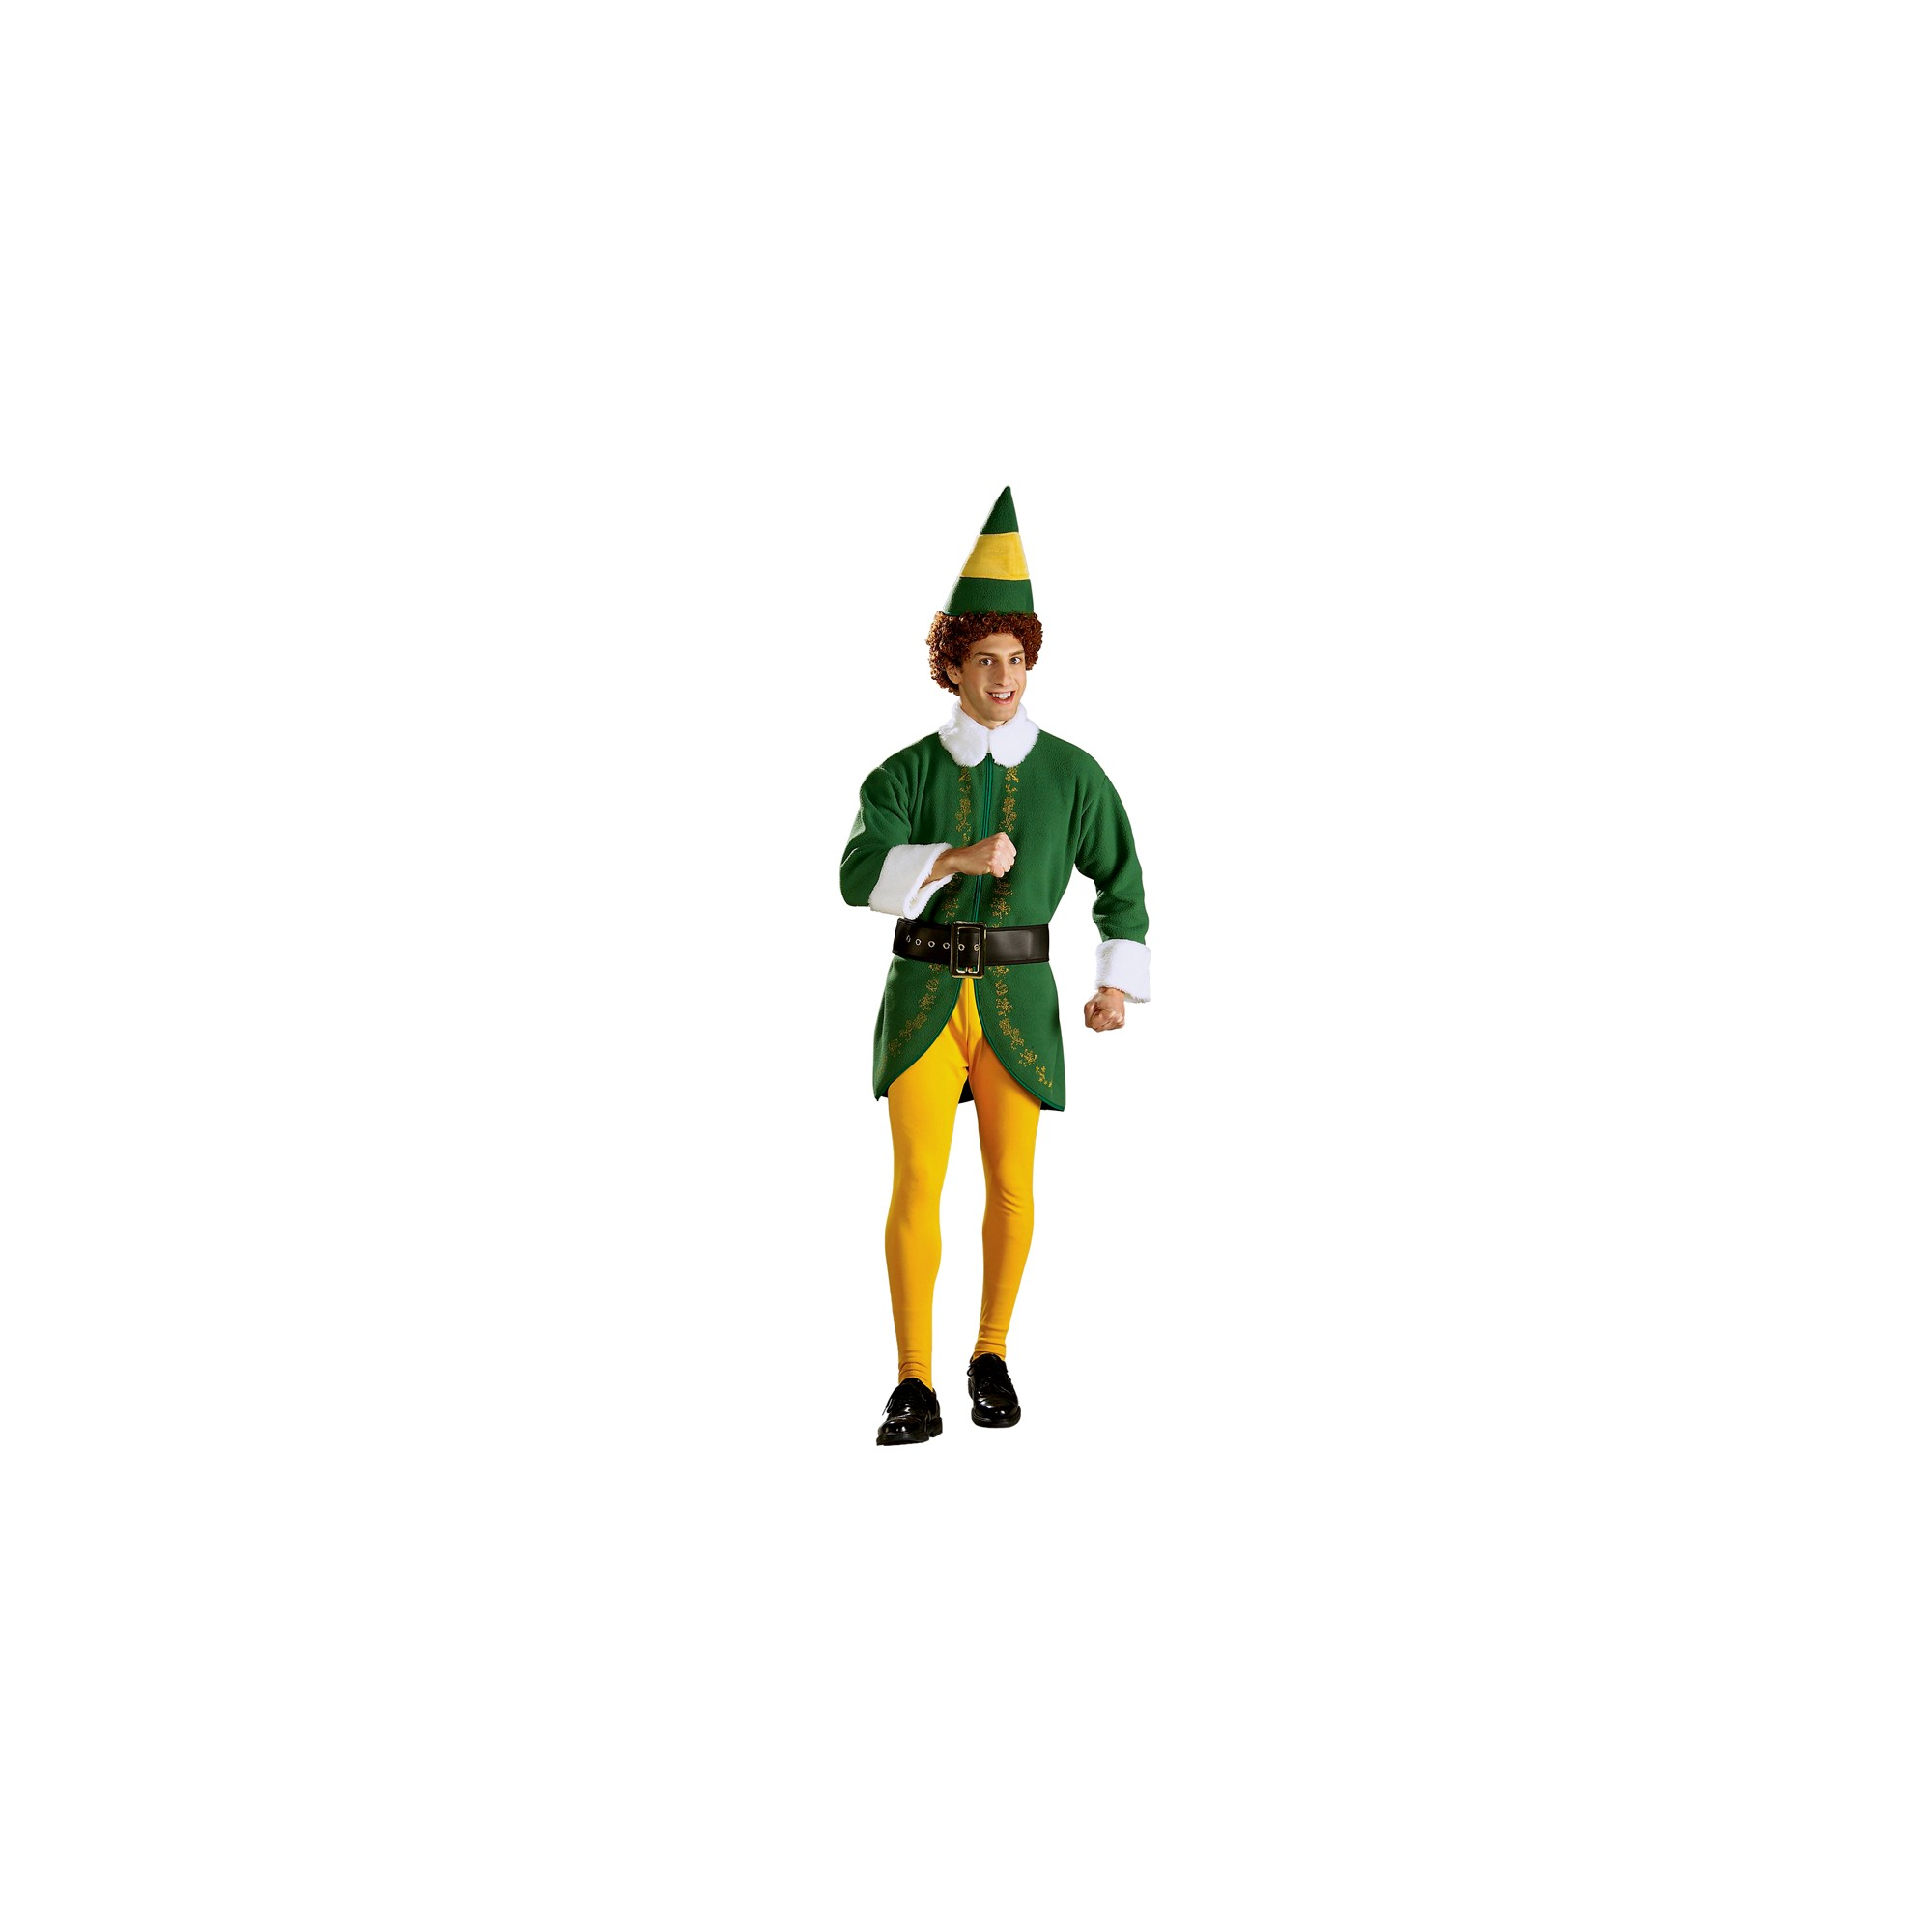 Halloween Men's Buddy Elf Costume XL, Size: XL, Gold/Green/Yellow